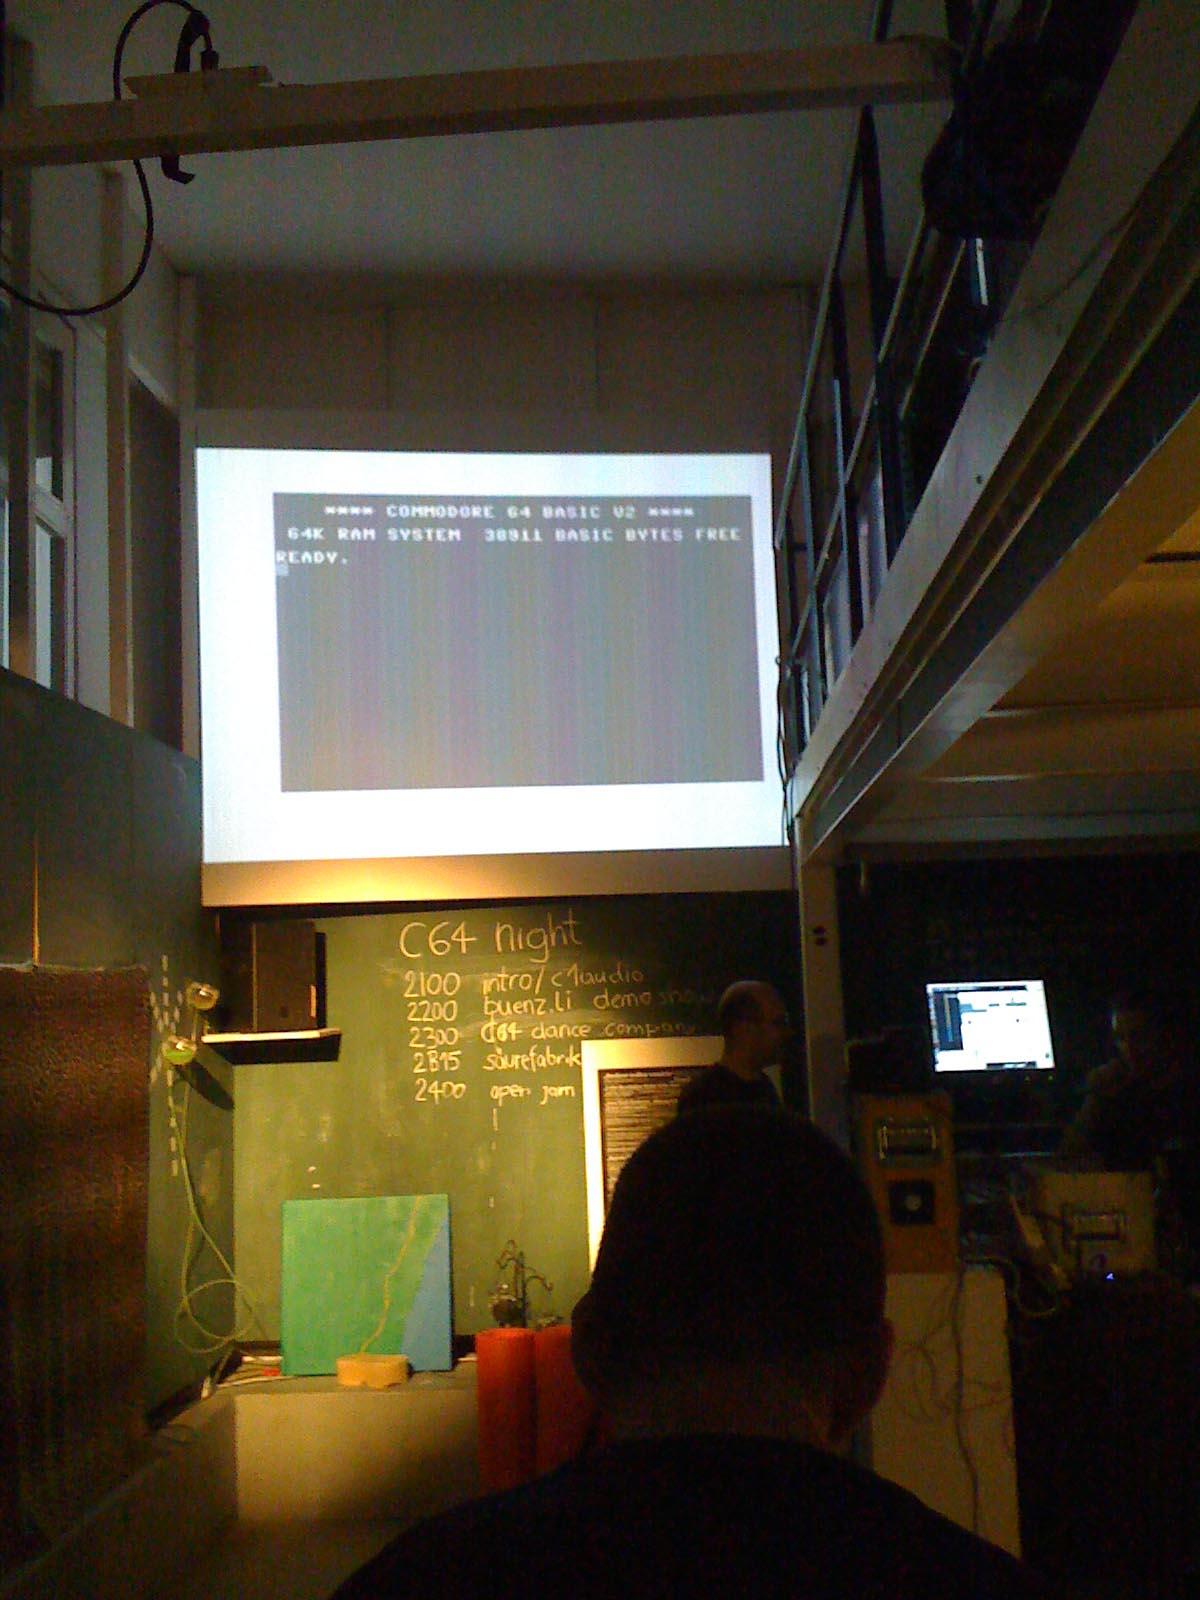 C64 Nacht @ Rote Fabrik